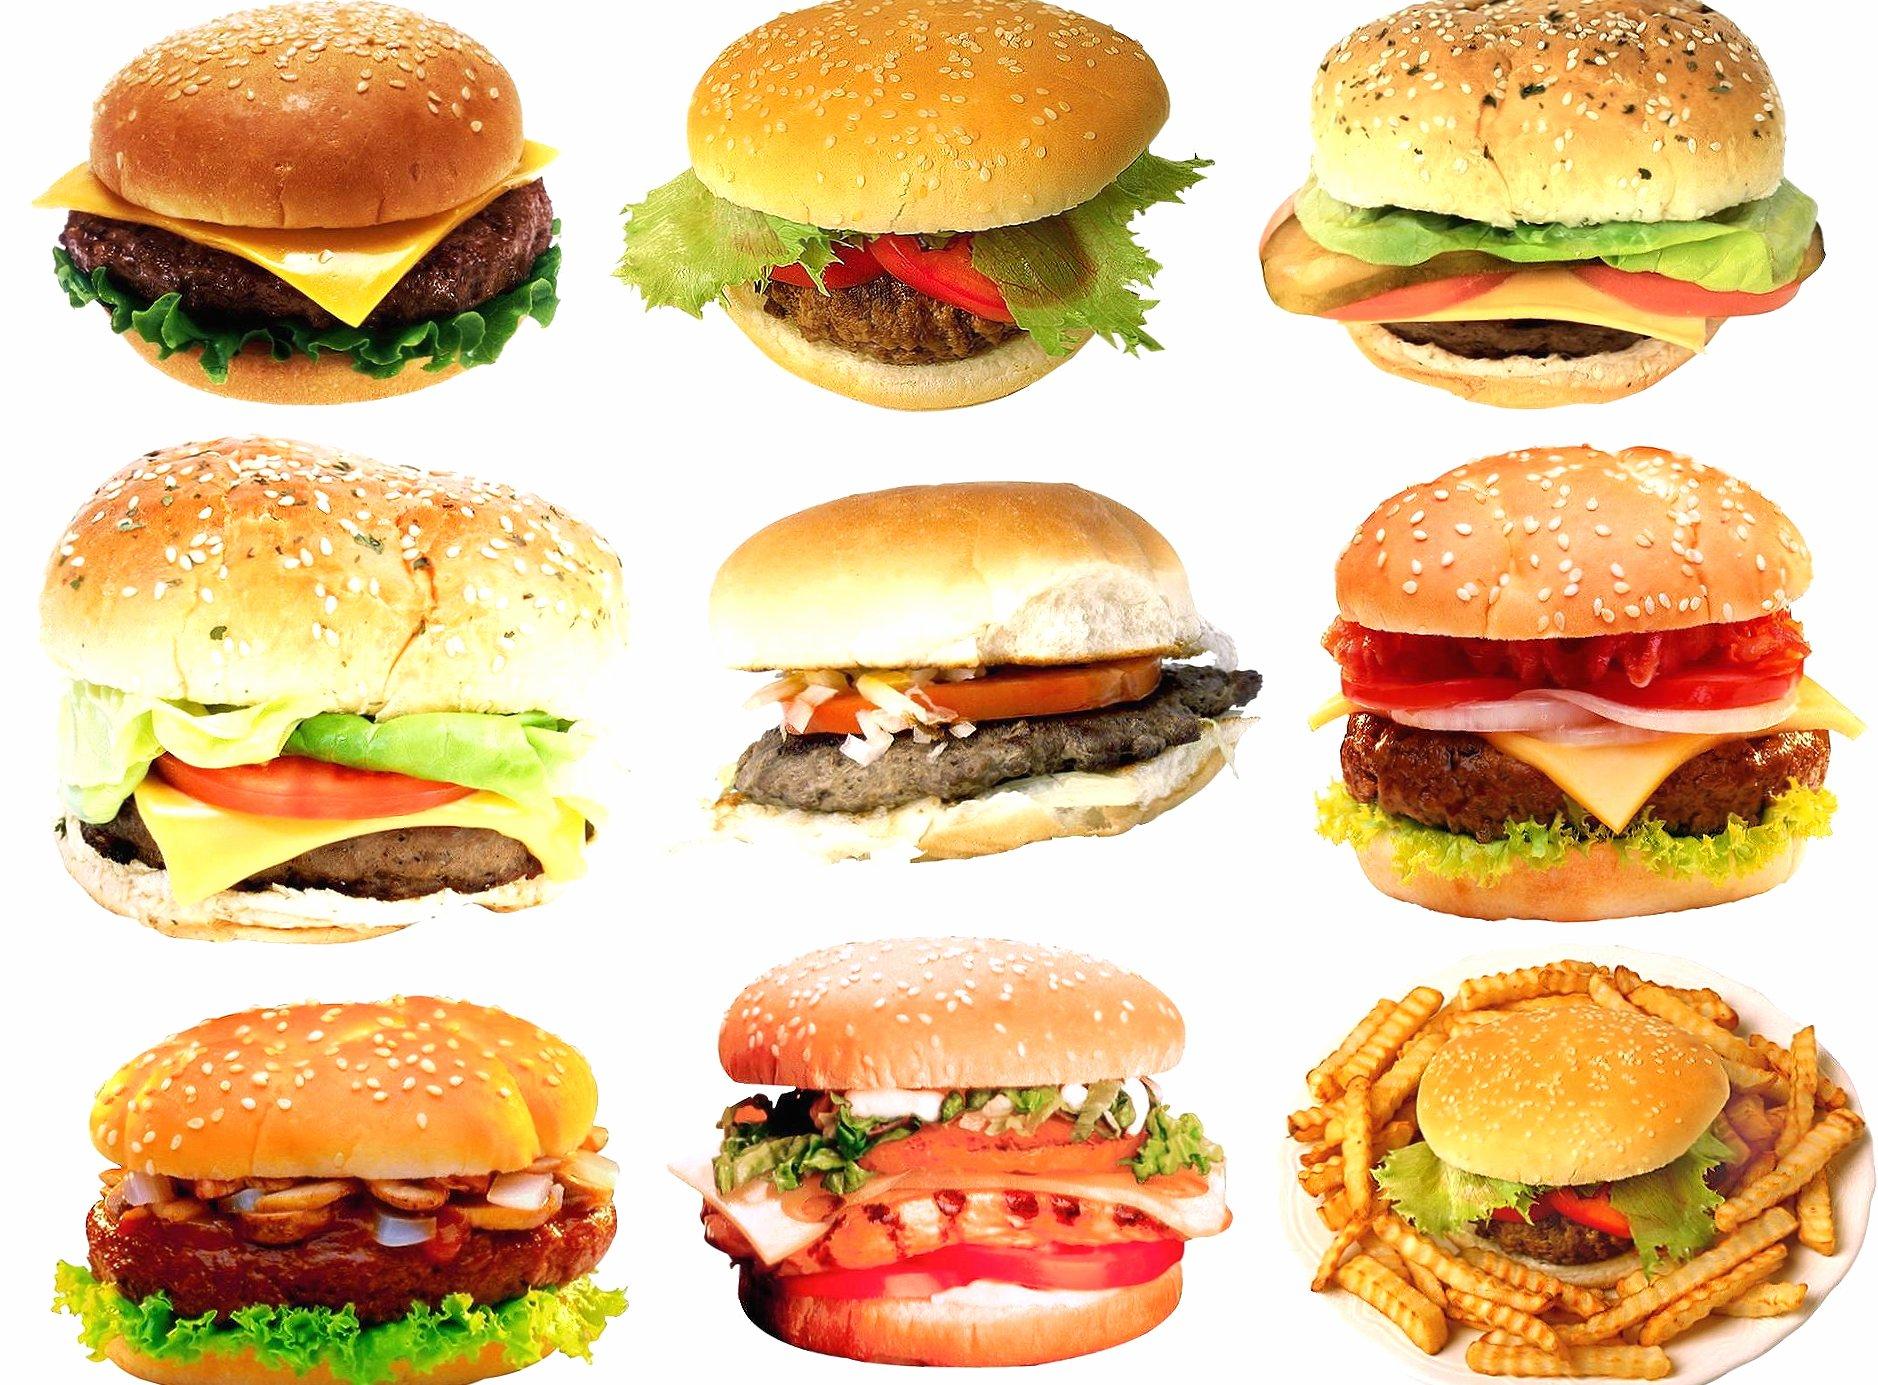 Many hamburgers wallpapers HD quality